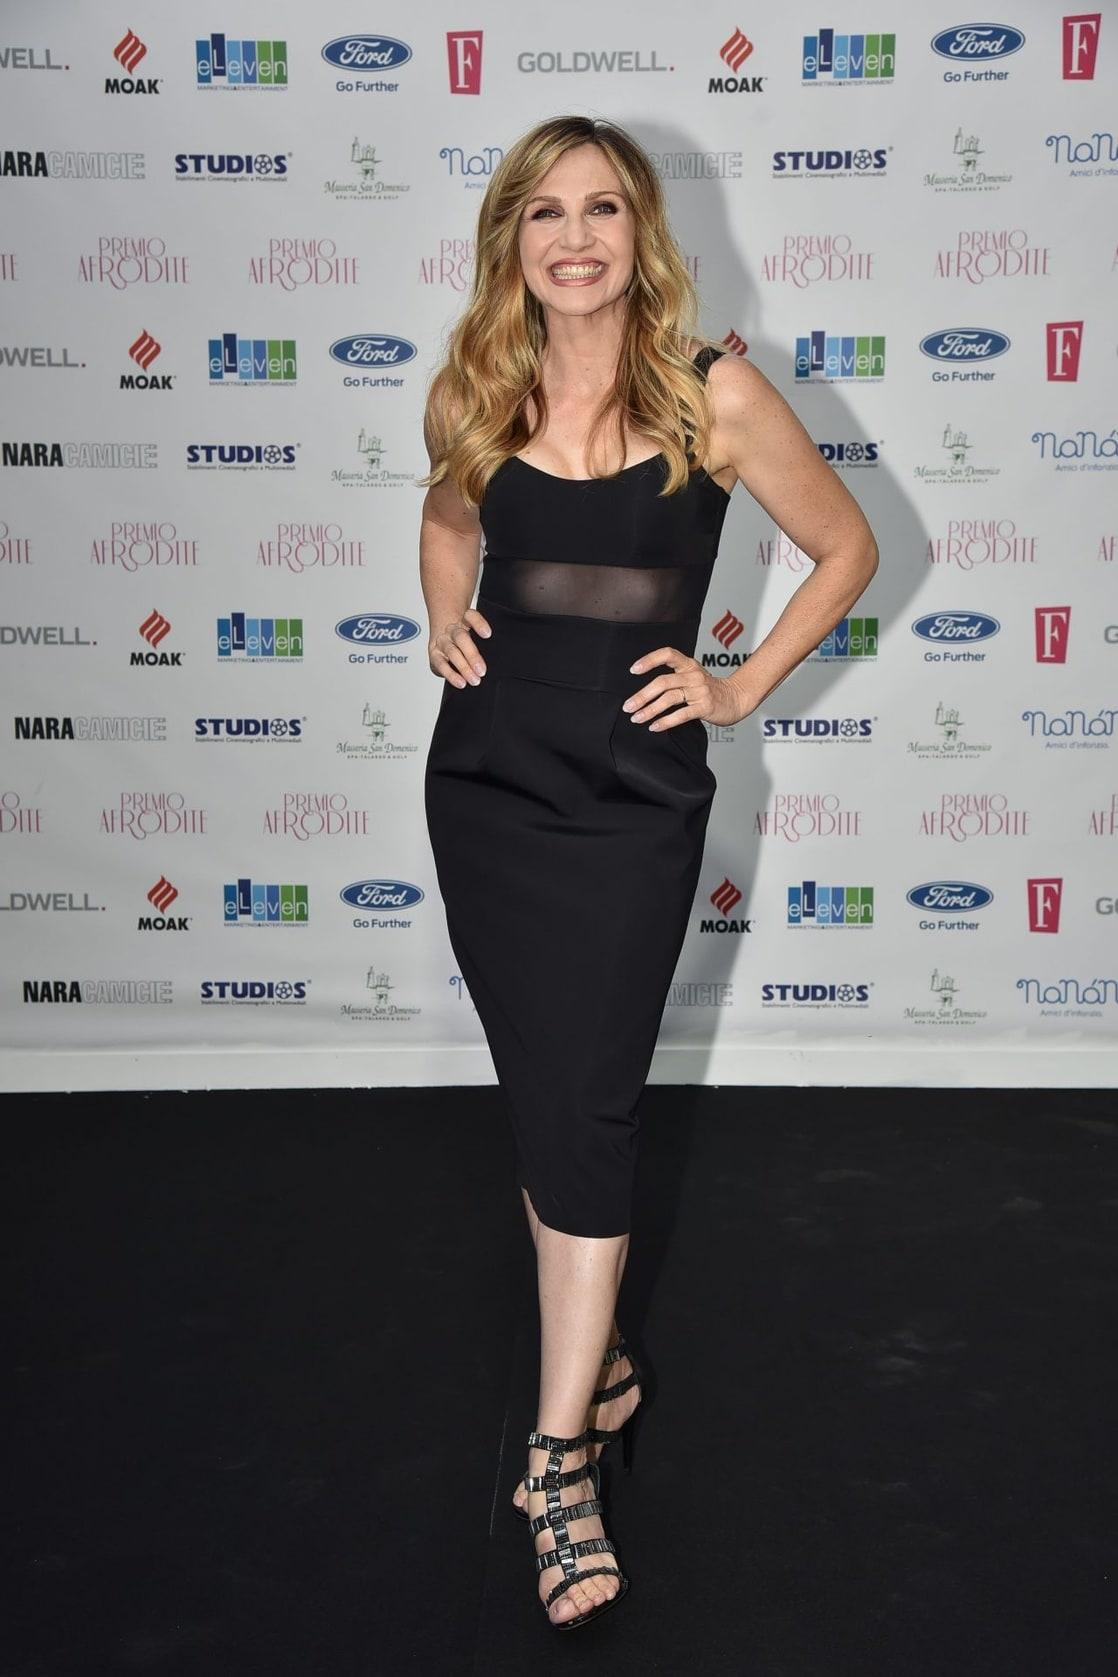 Watch Lorella Cuccarini video